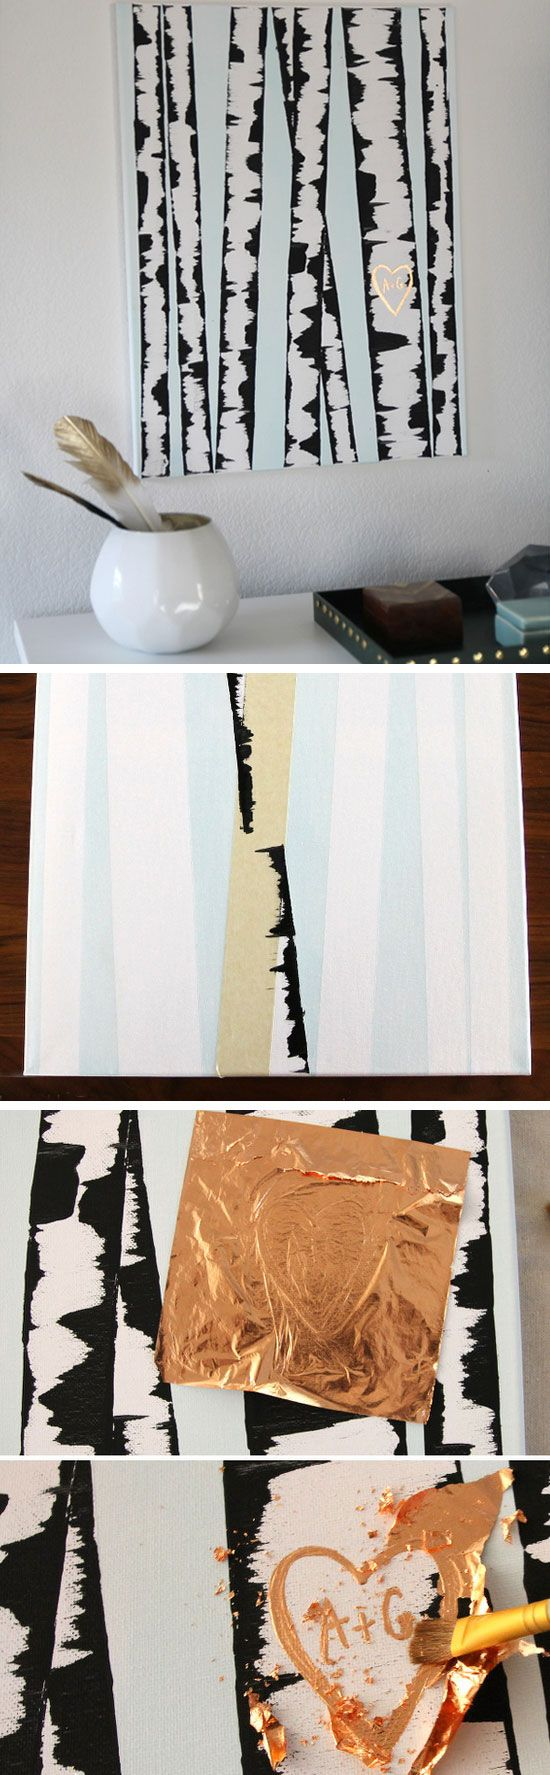 30 DIY Home Decor Ideas on a Budget | Pinterest | Tree wall art, Diy ...